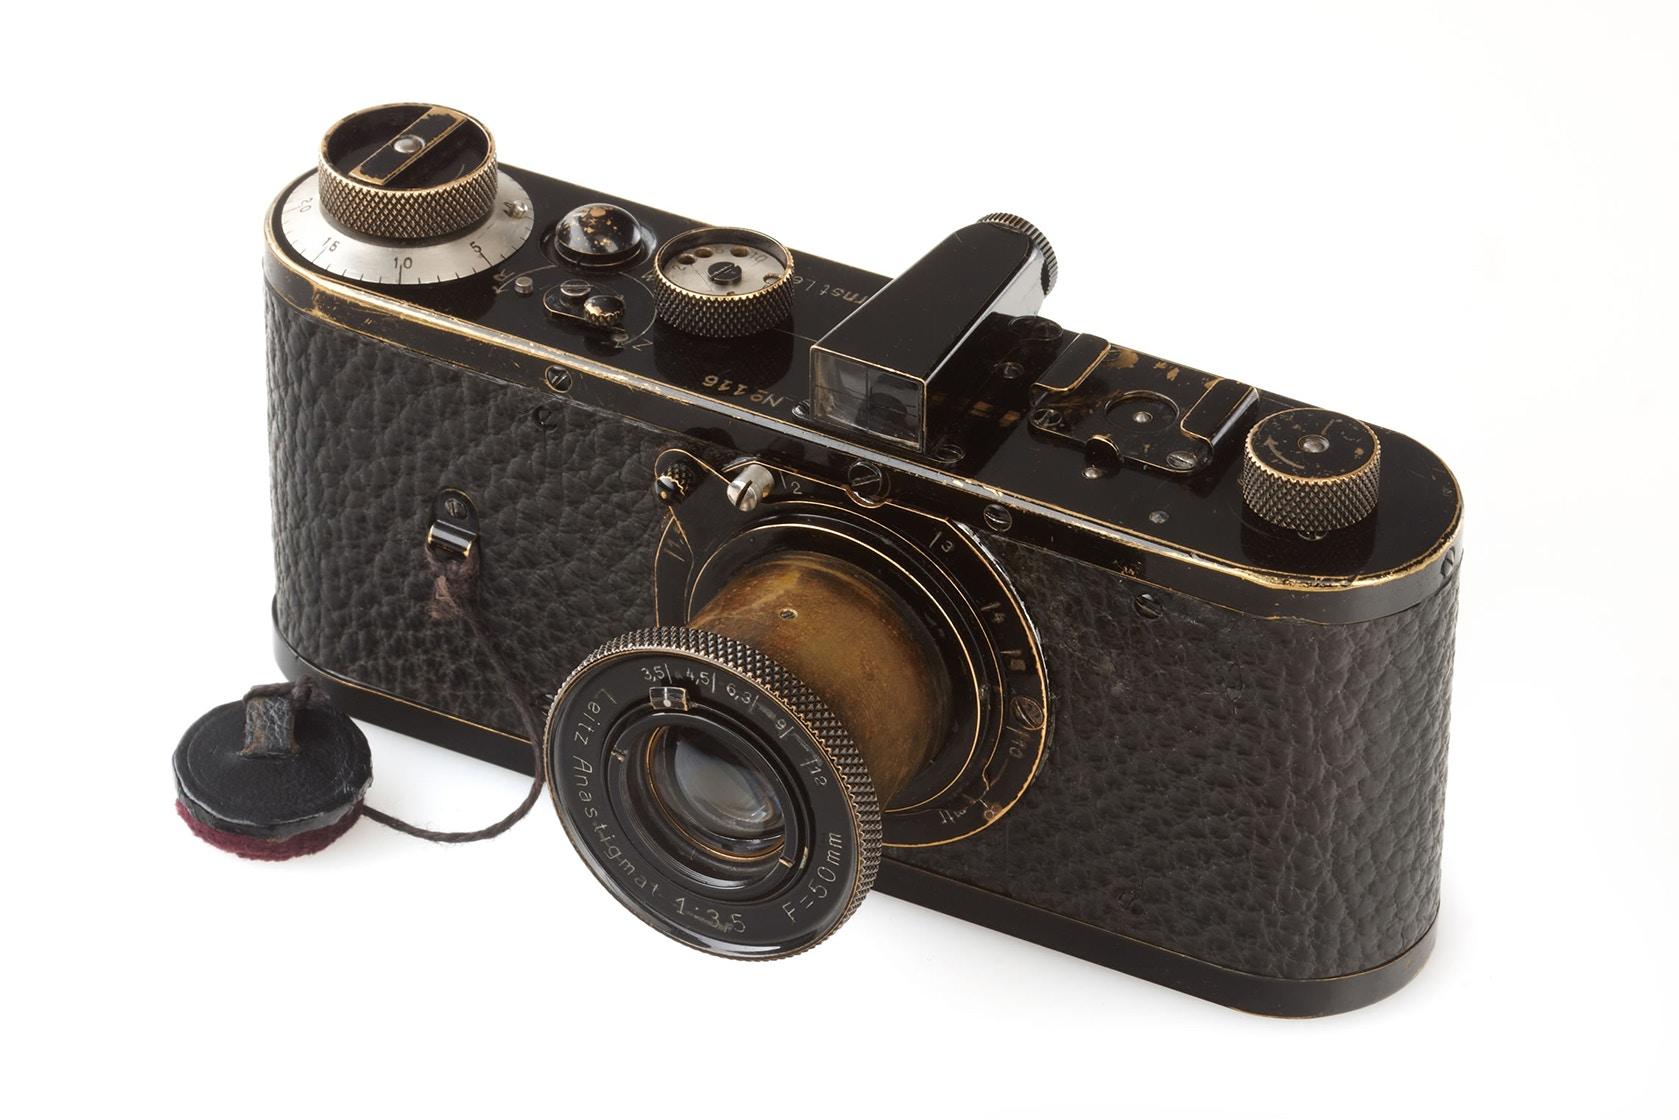 Leica O-Series